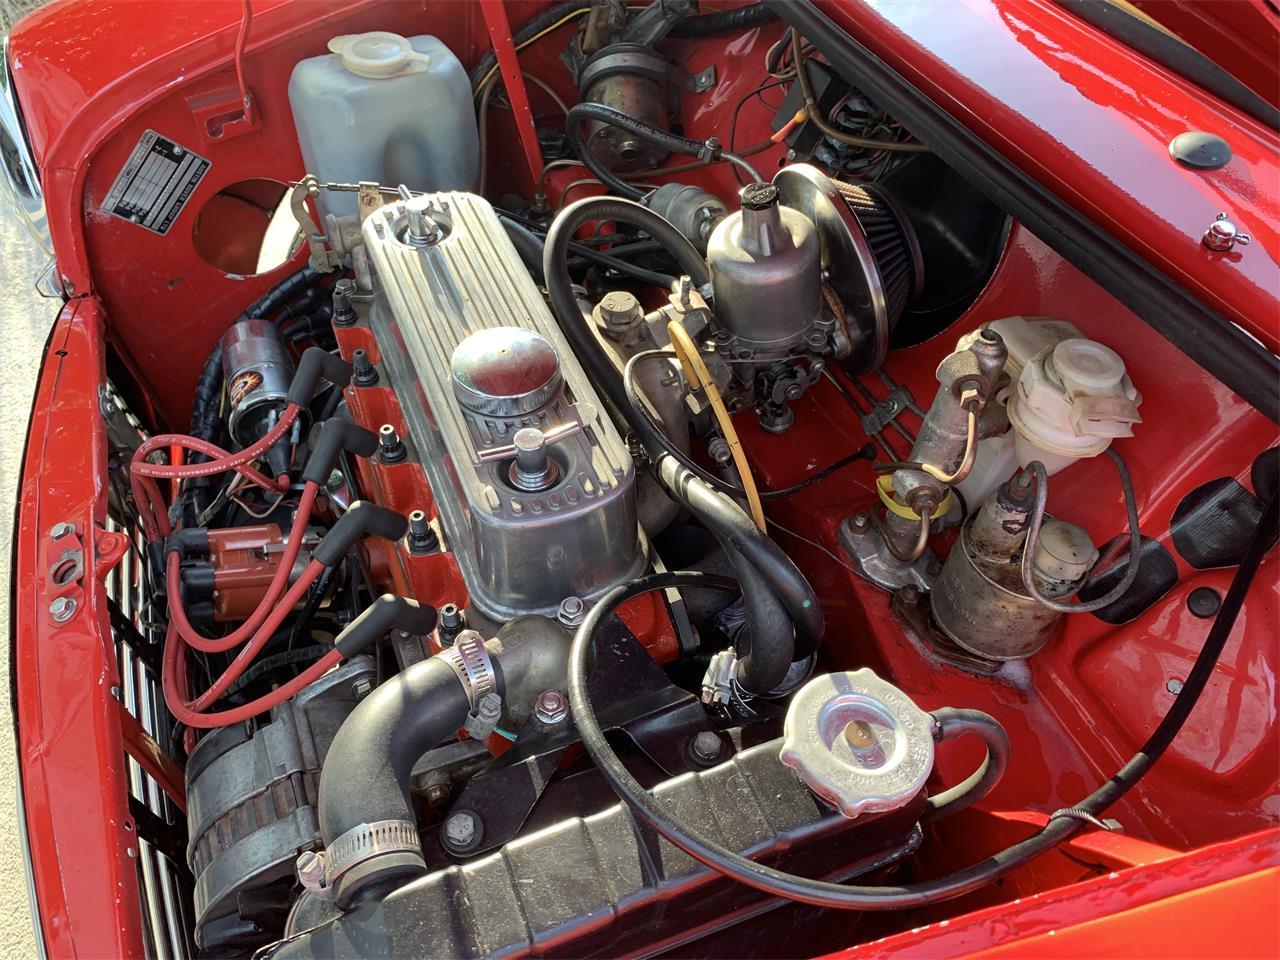 1986 Austin Mini (CC-1272149) for sale in High Point, North Carolina